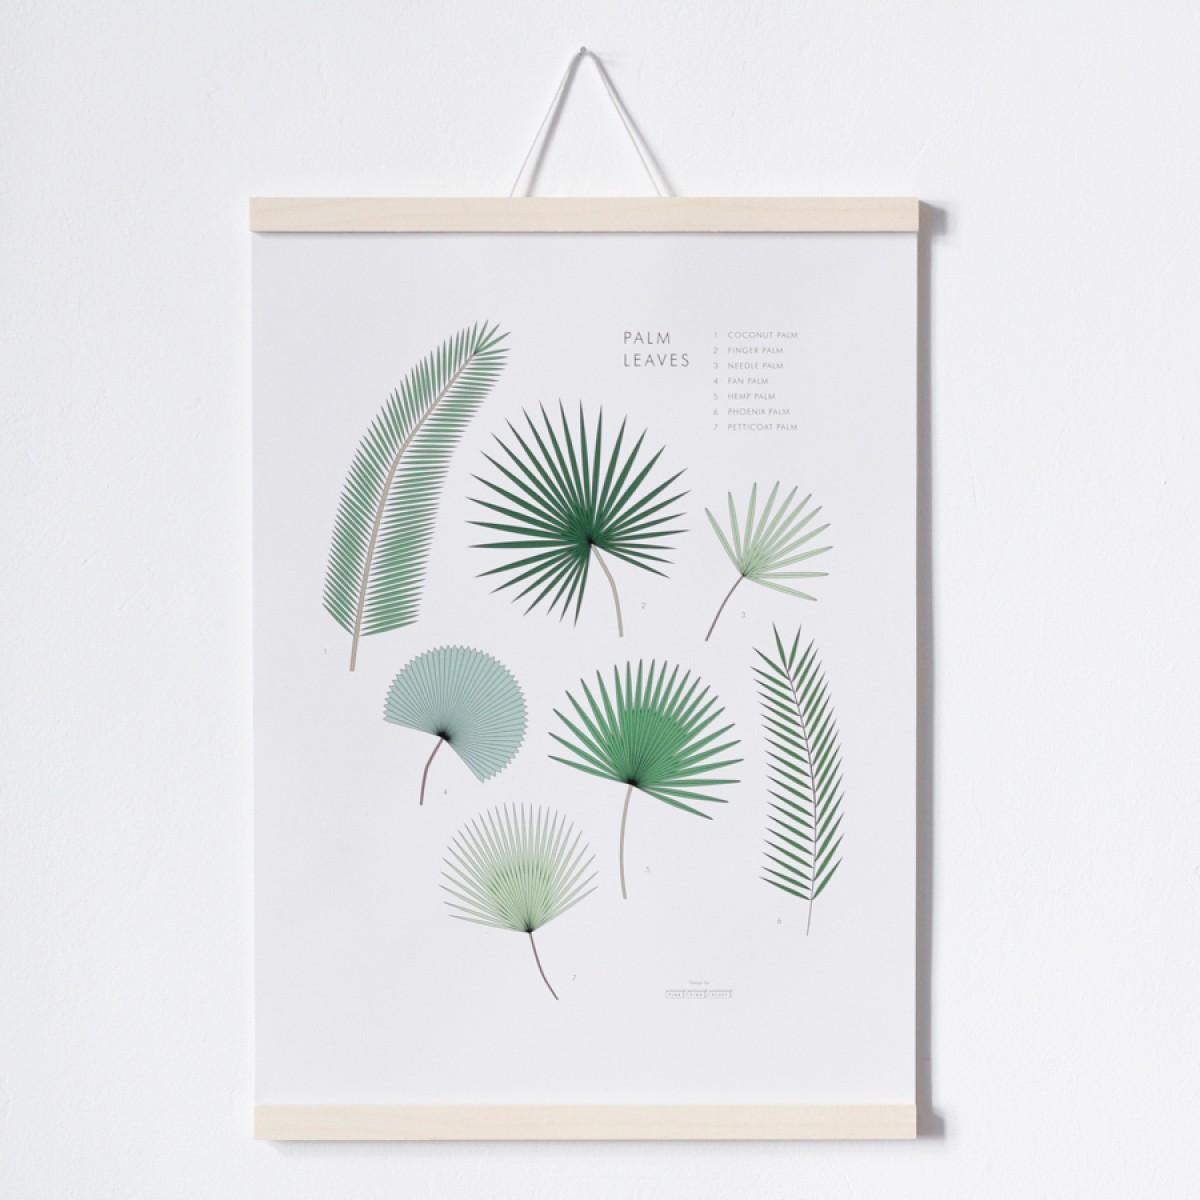 FINE FINE STUFF - Poster Palm Leaves - A3